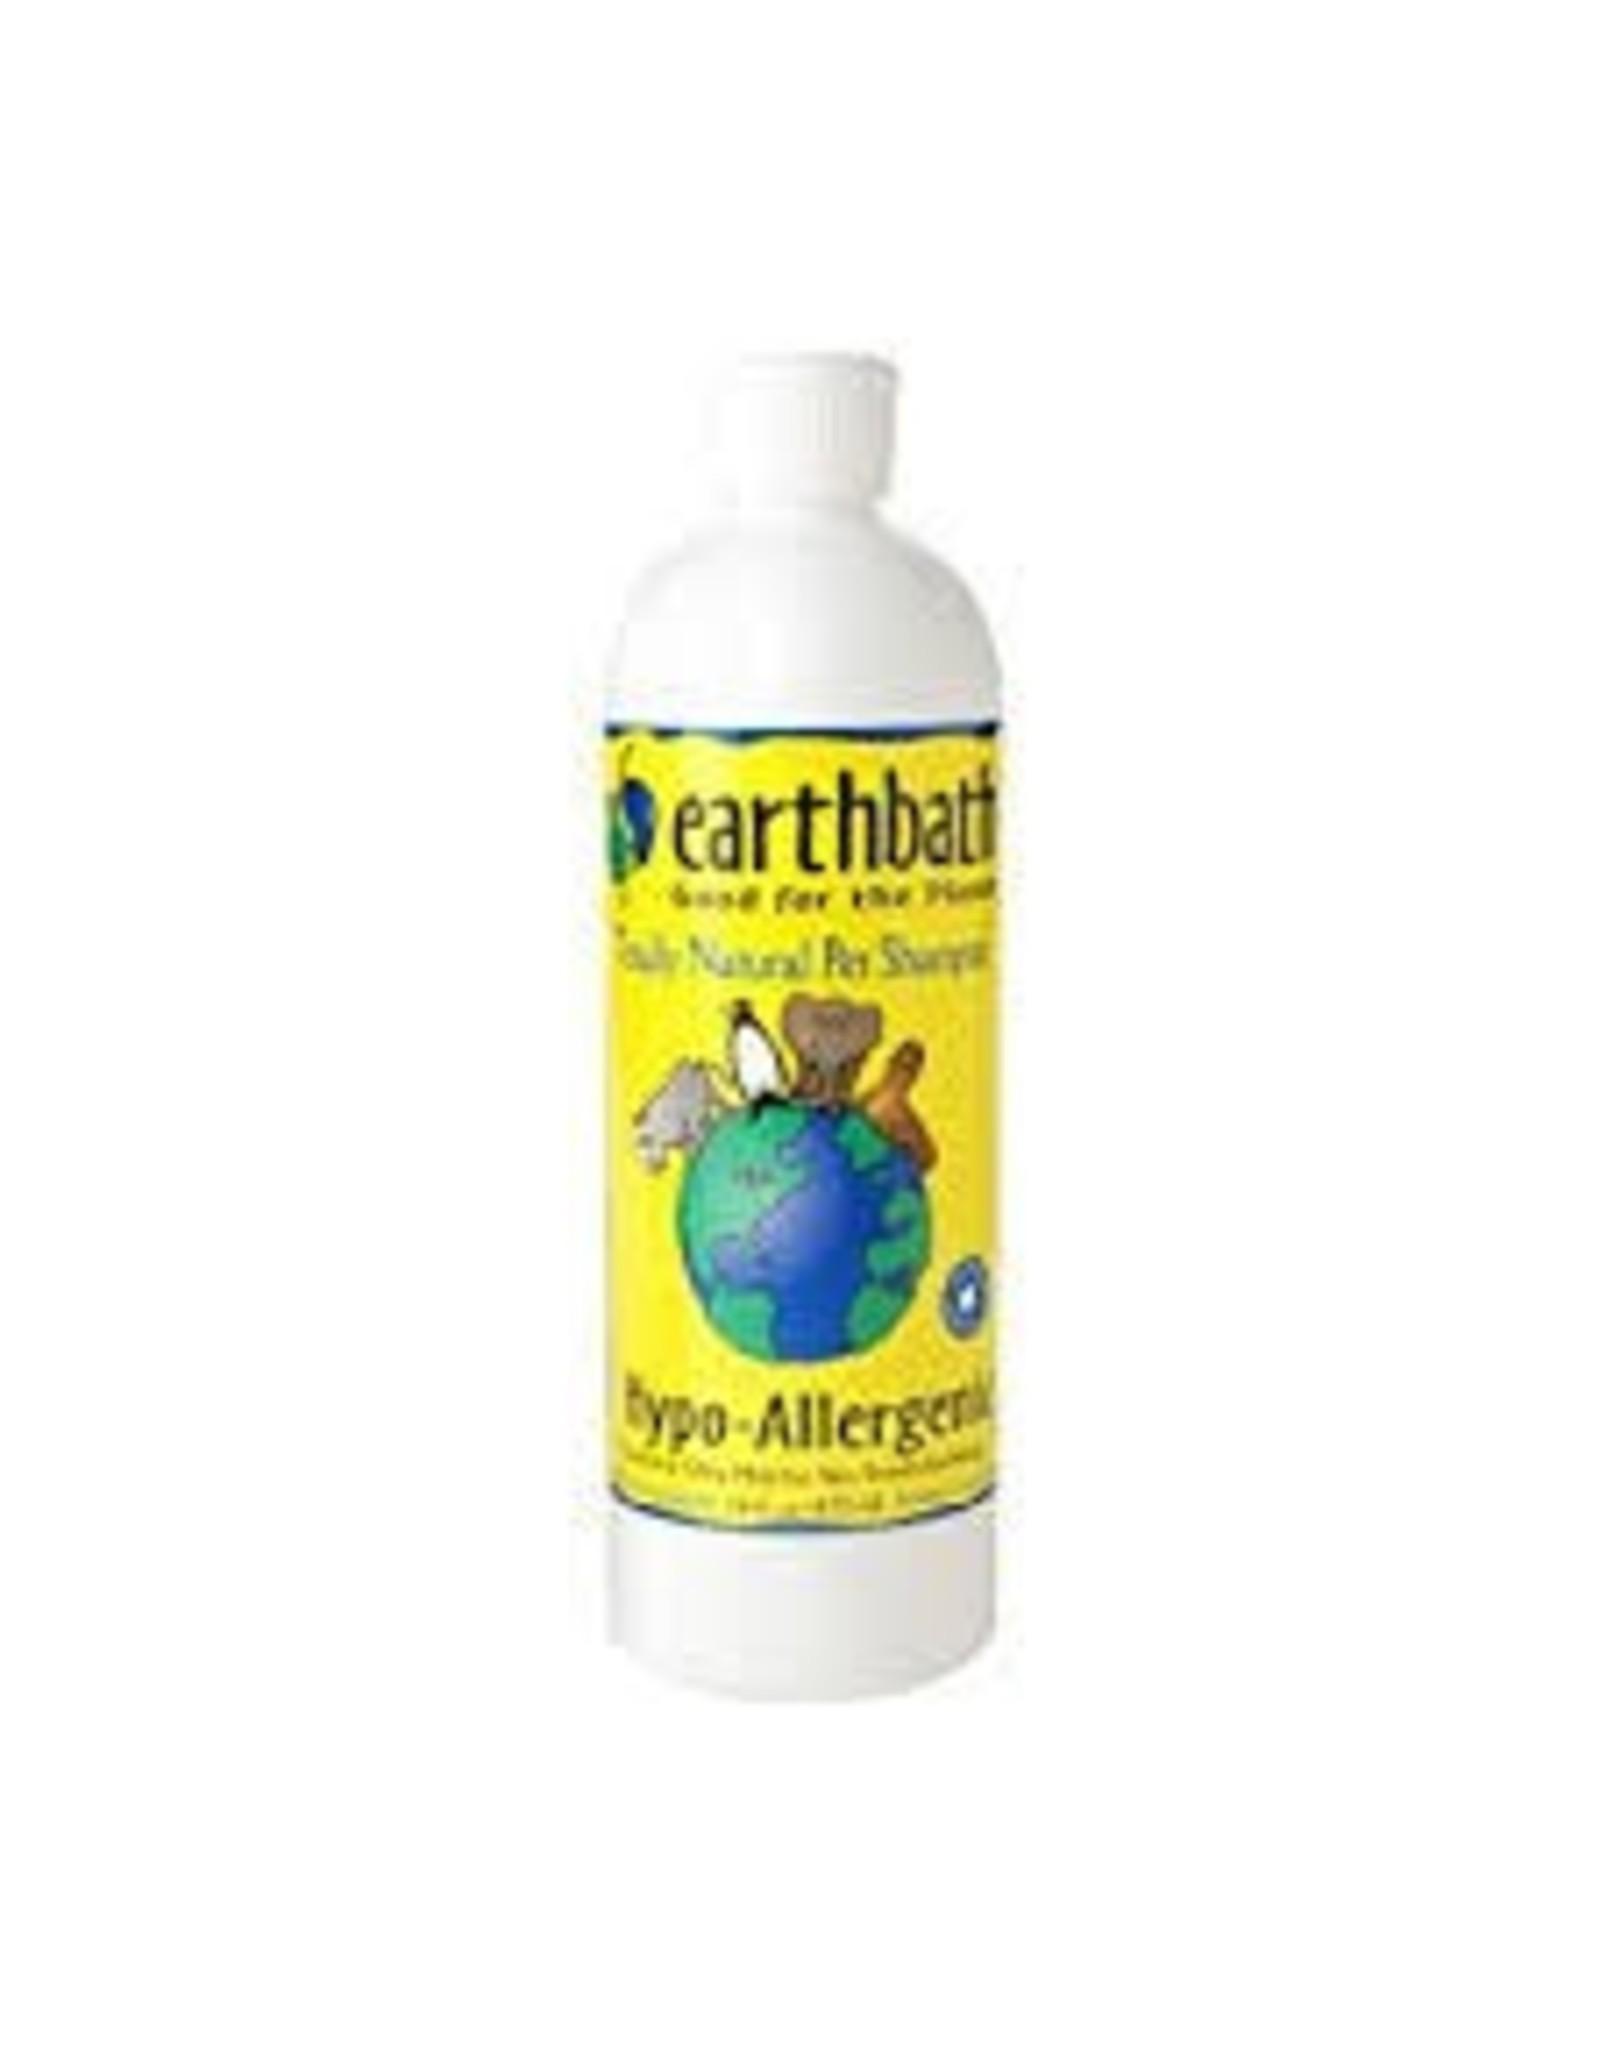 EARTHBATH EARTHBATH HYPOALLERGENIC SHAMPOO